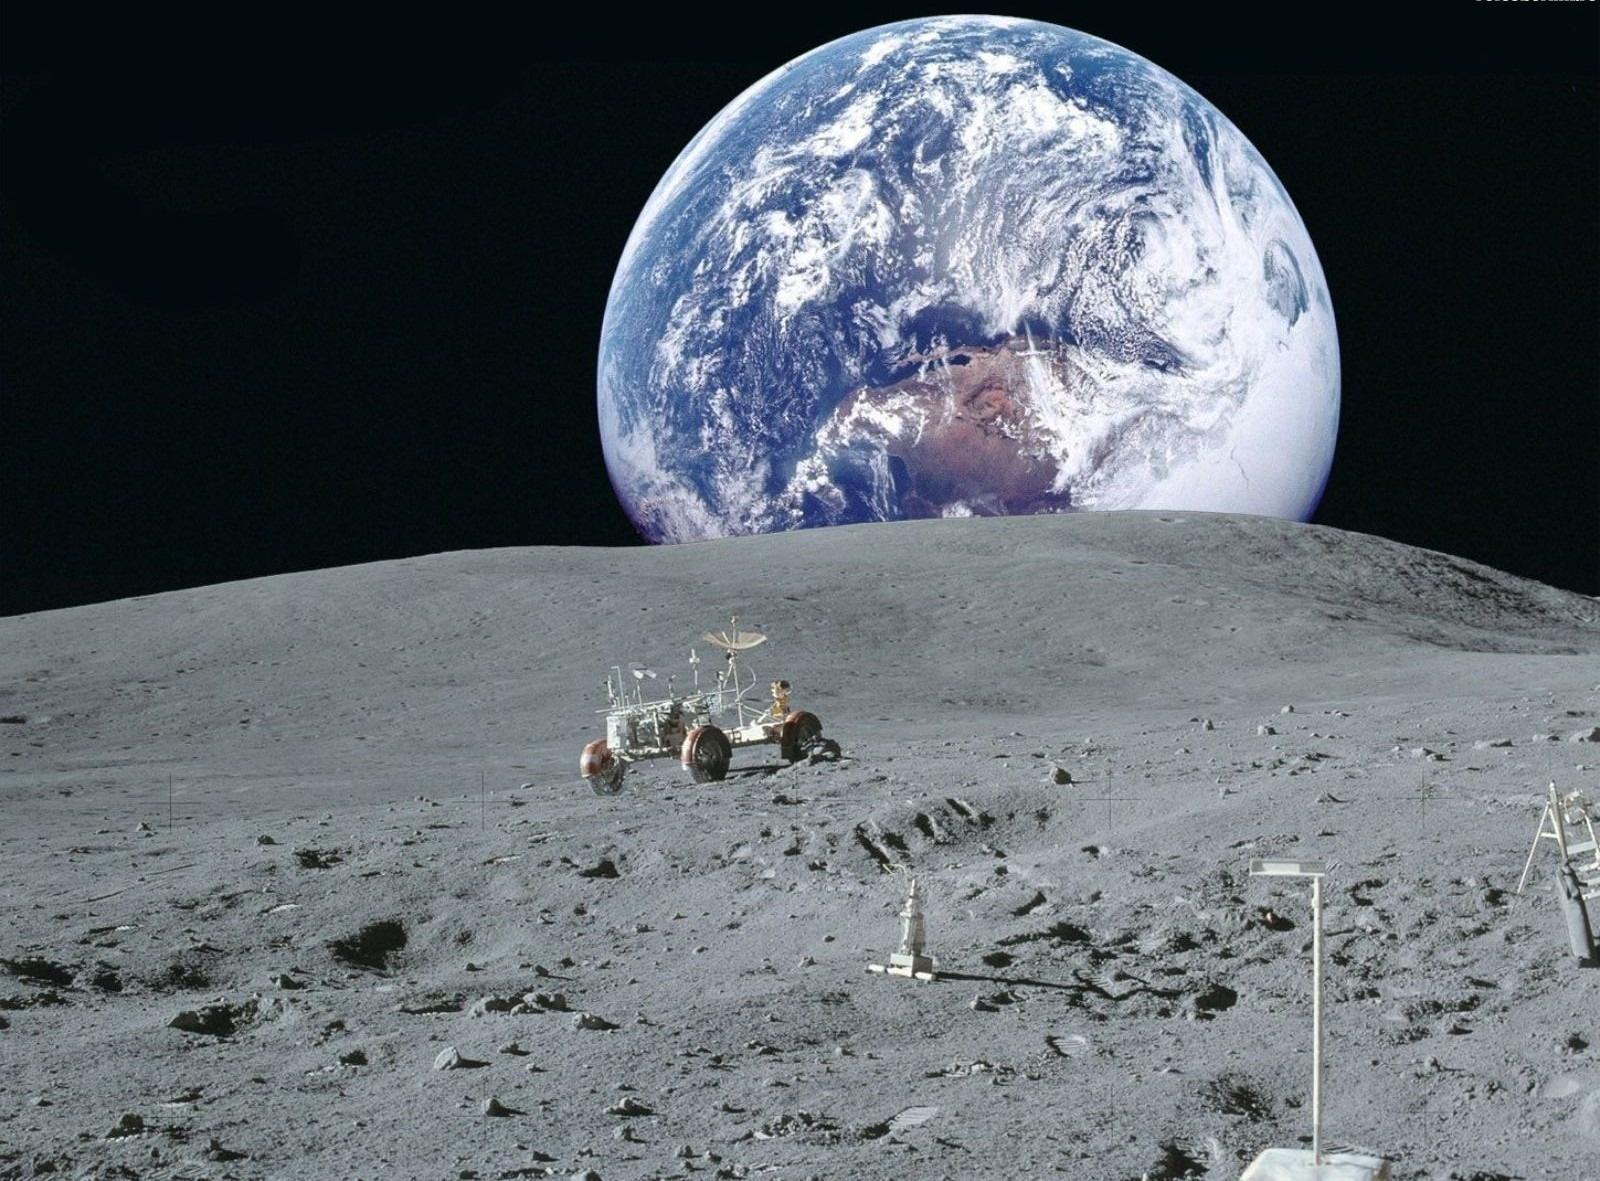 Wallpaper Space Moon Earth planet NASA desktop wallpaper Other 1600x1181